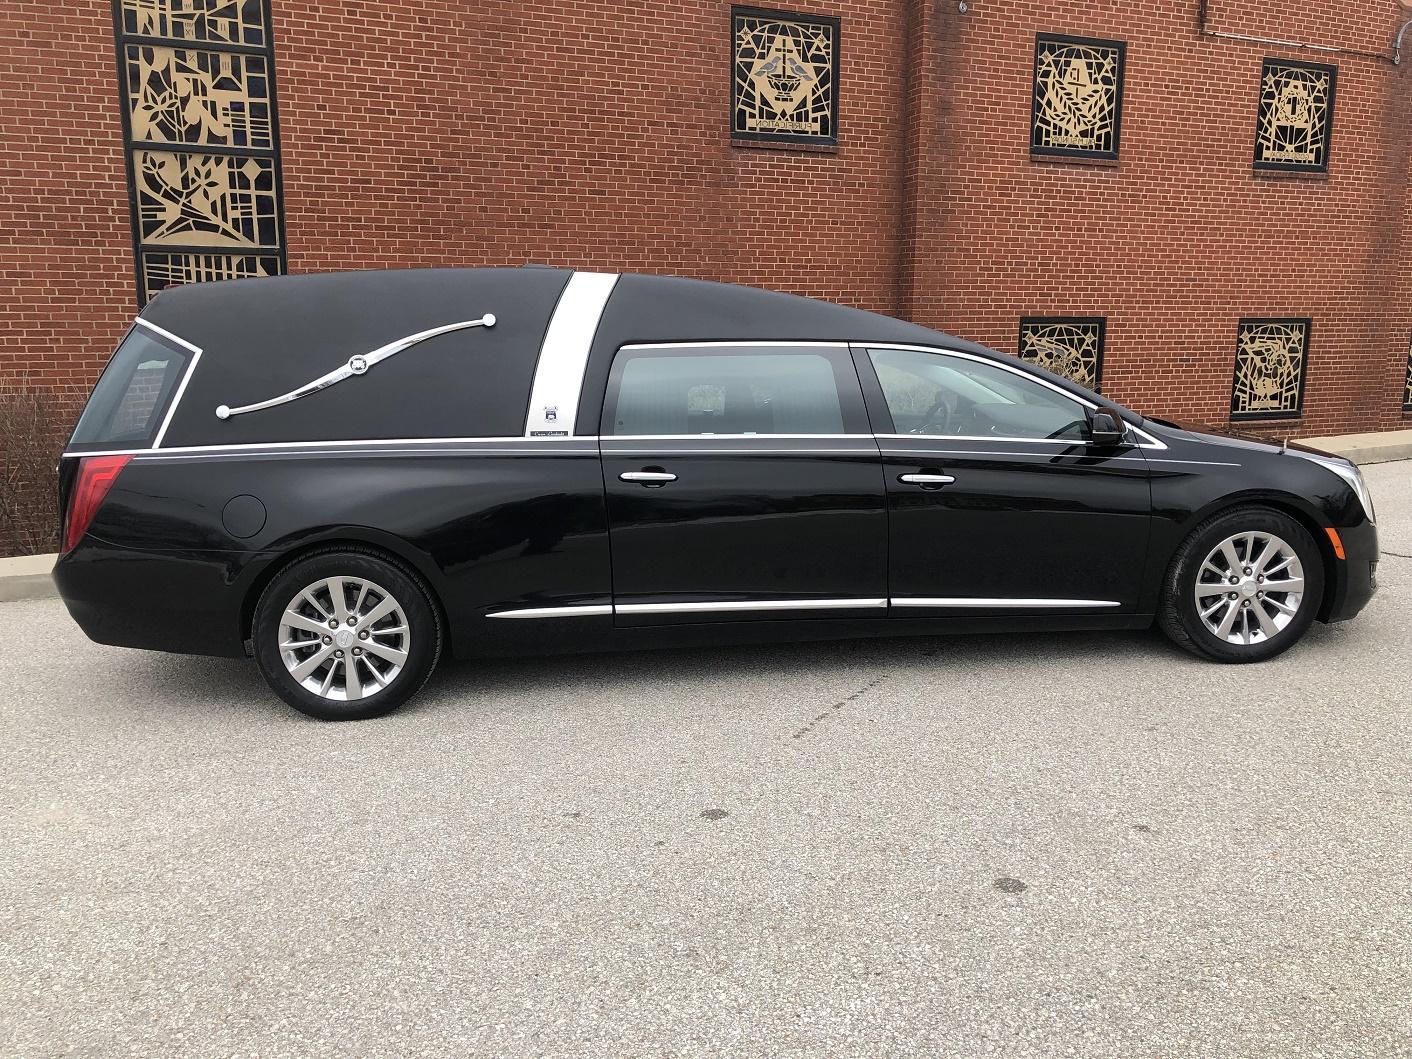 2017 Armbruster Stageway Black Funeral Coach for Sale Crown Landaulet 1